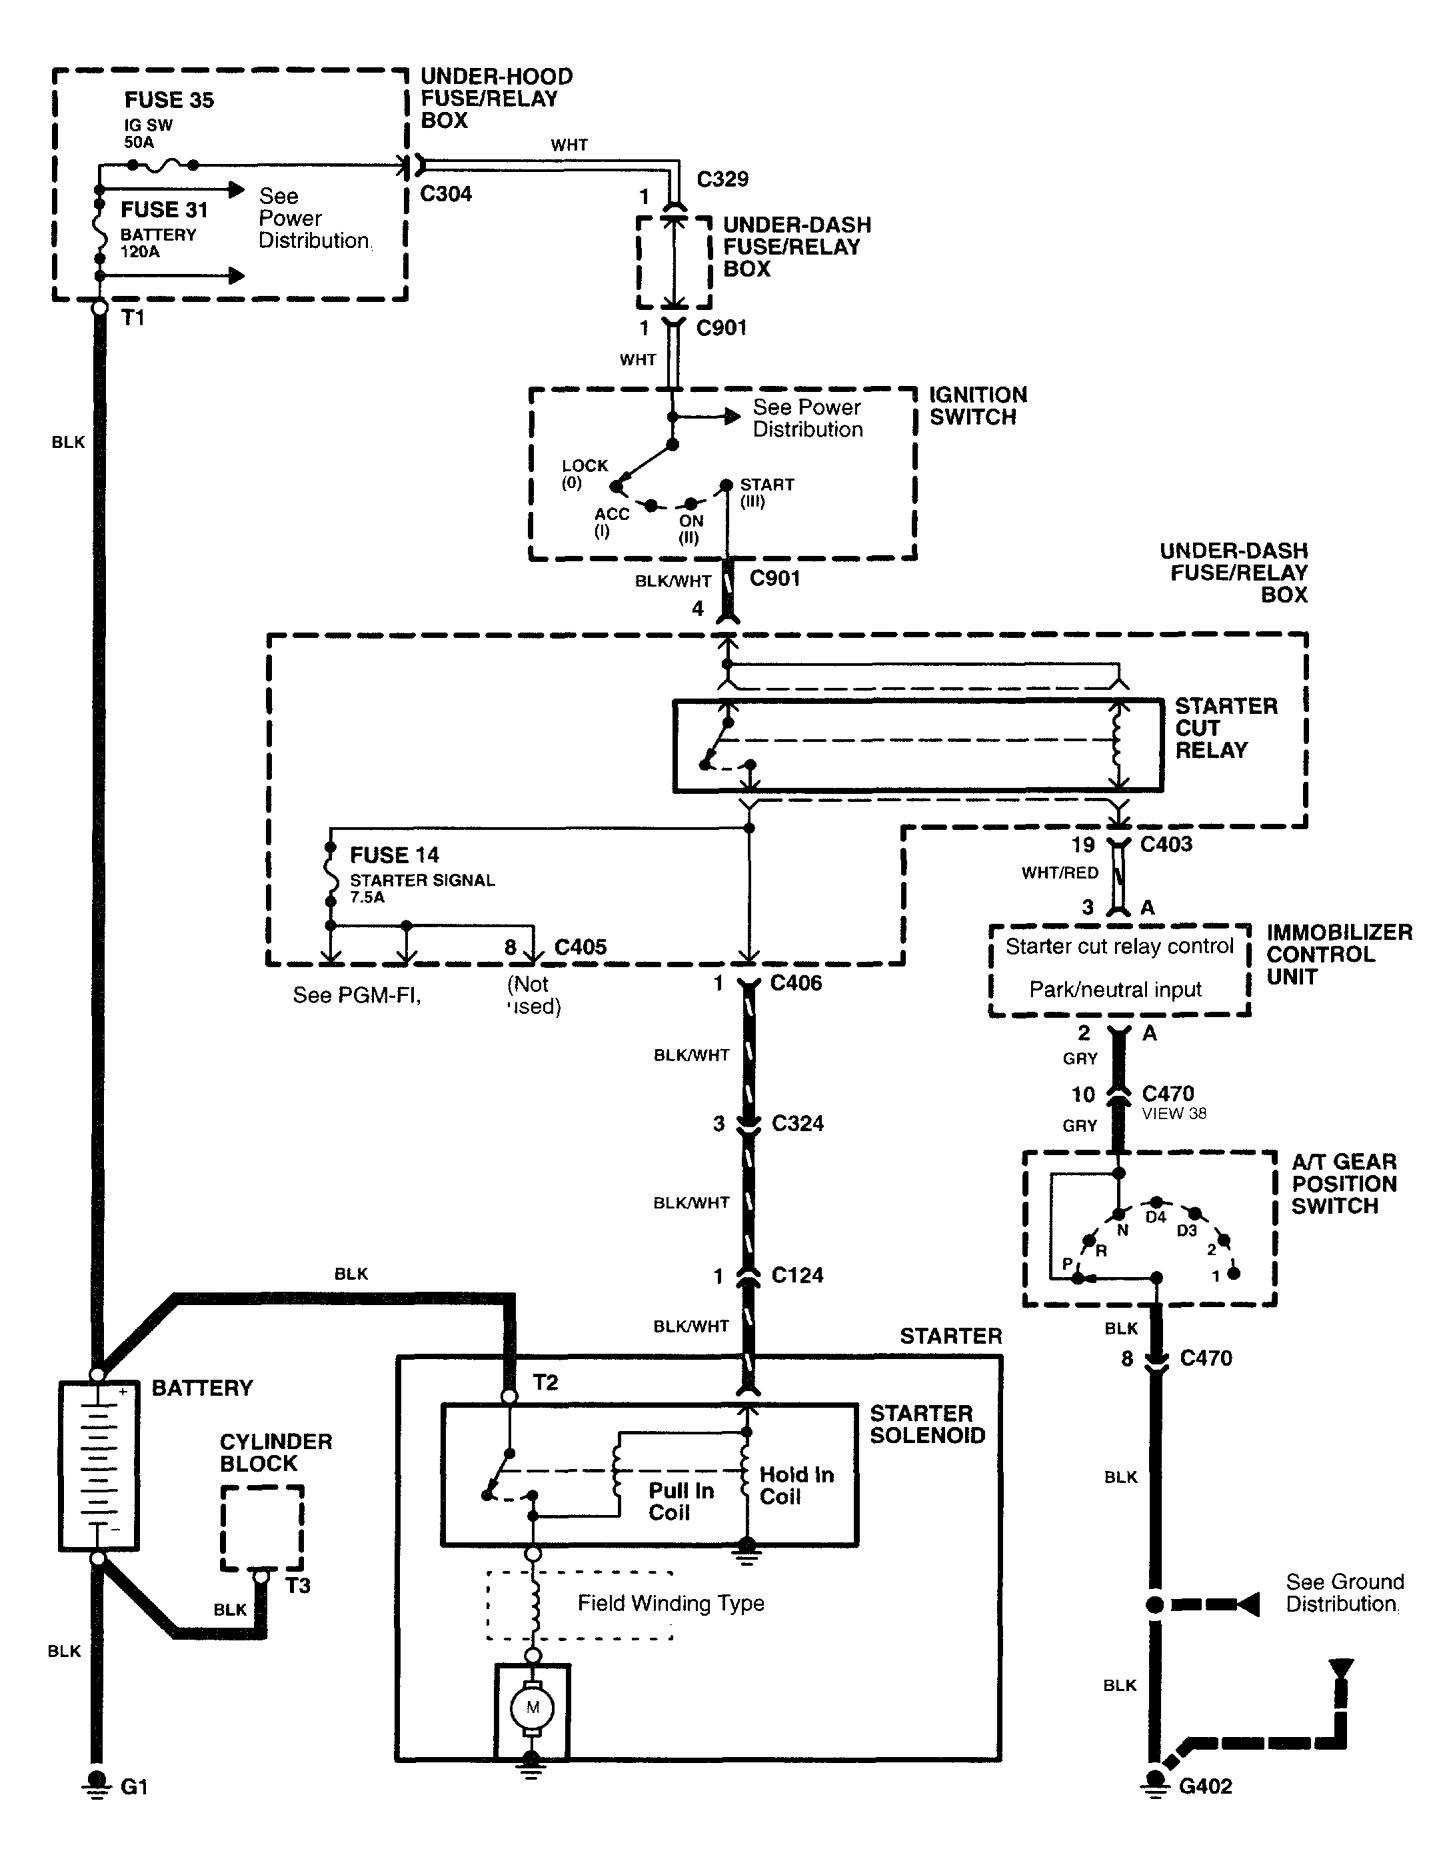 Acura RL (2003 - 2004) - wiring diagrams - starting ...